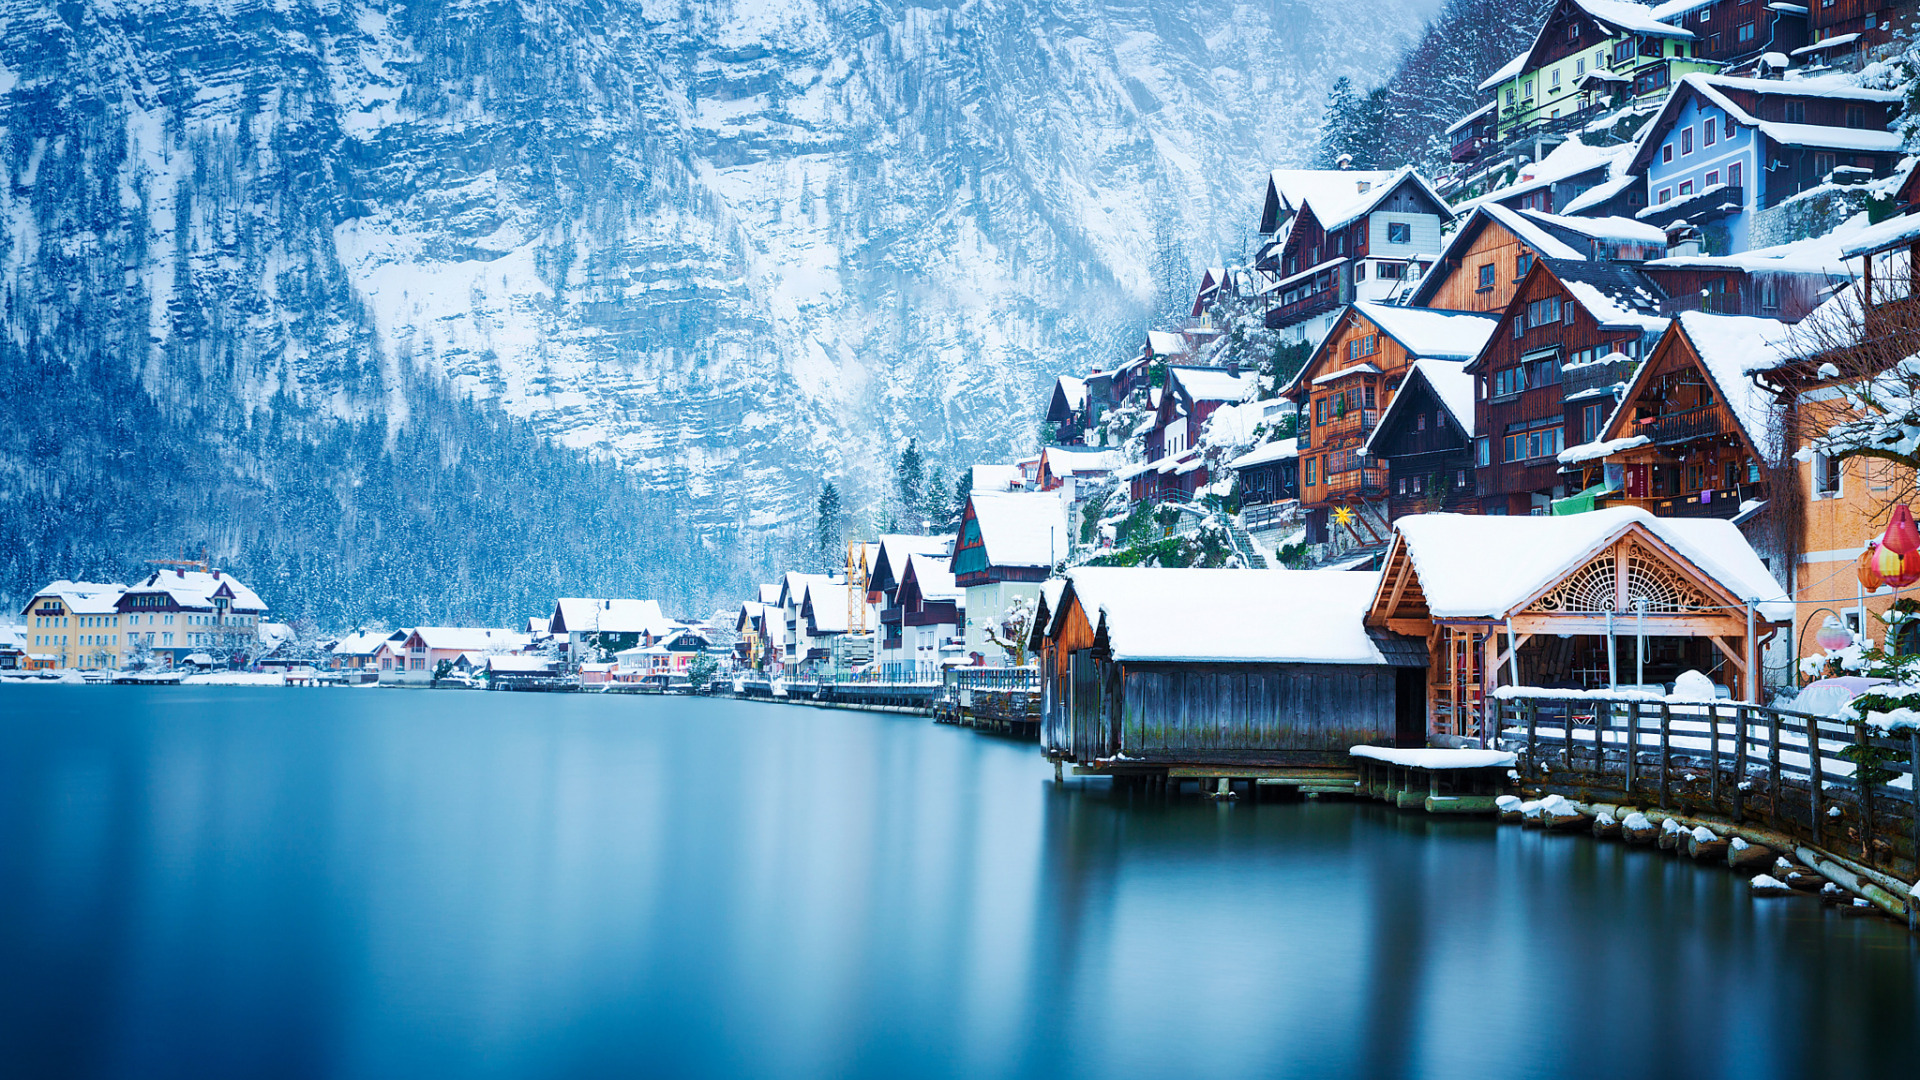 Download Wallpaper Winter Snow Landscape Mountains Lake Home Austria Hallstatt Section City In Resolution 1920x1080